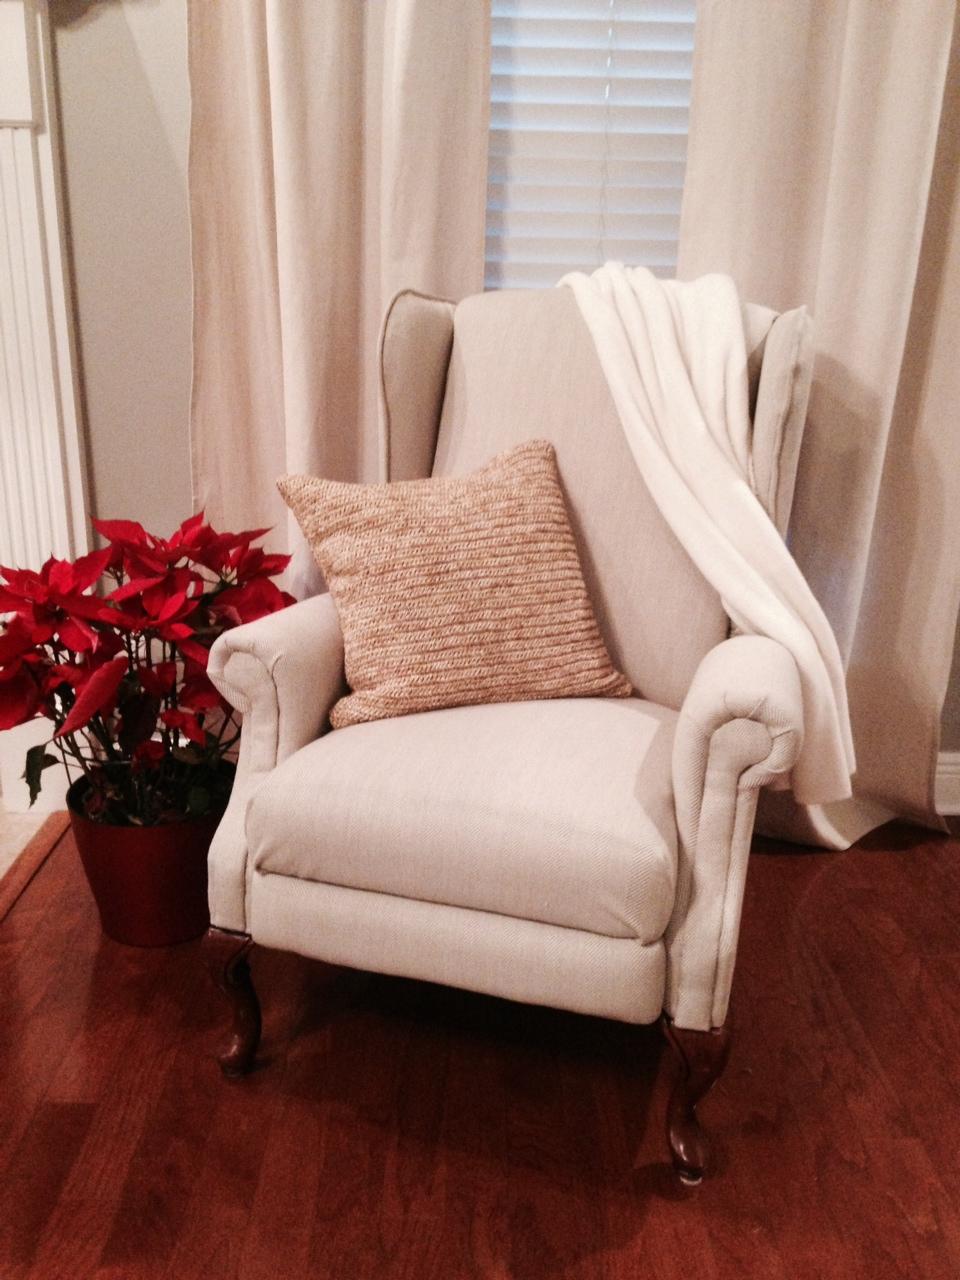 Re-upholstered Wingback Chair | DIYstinctlyMade.com